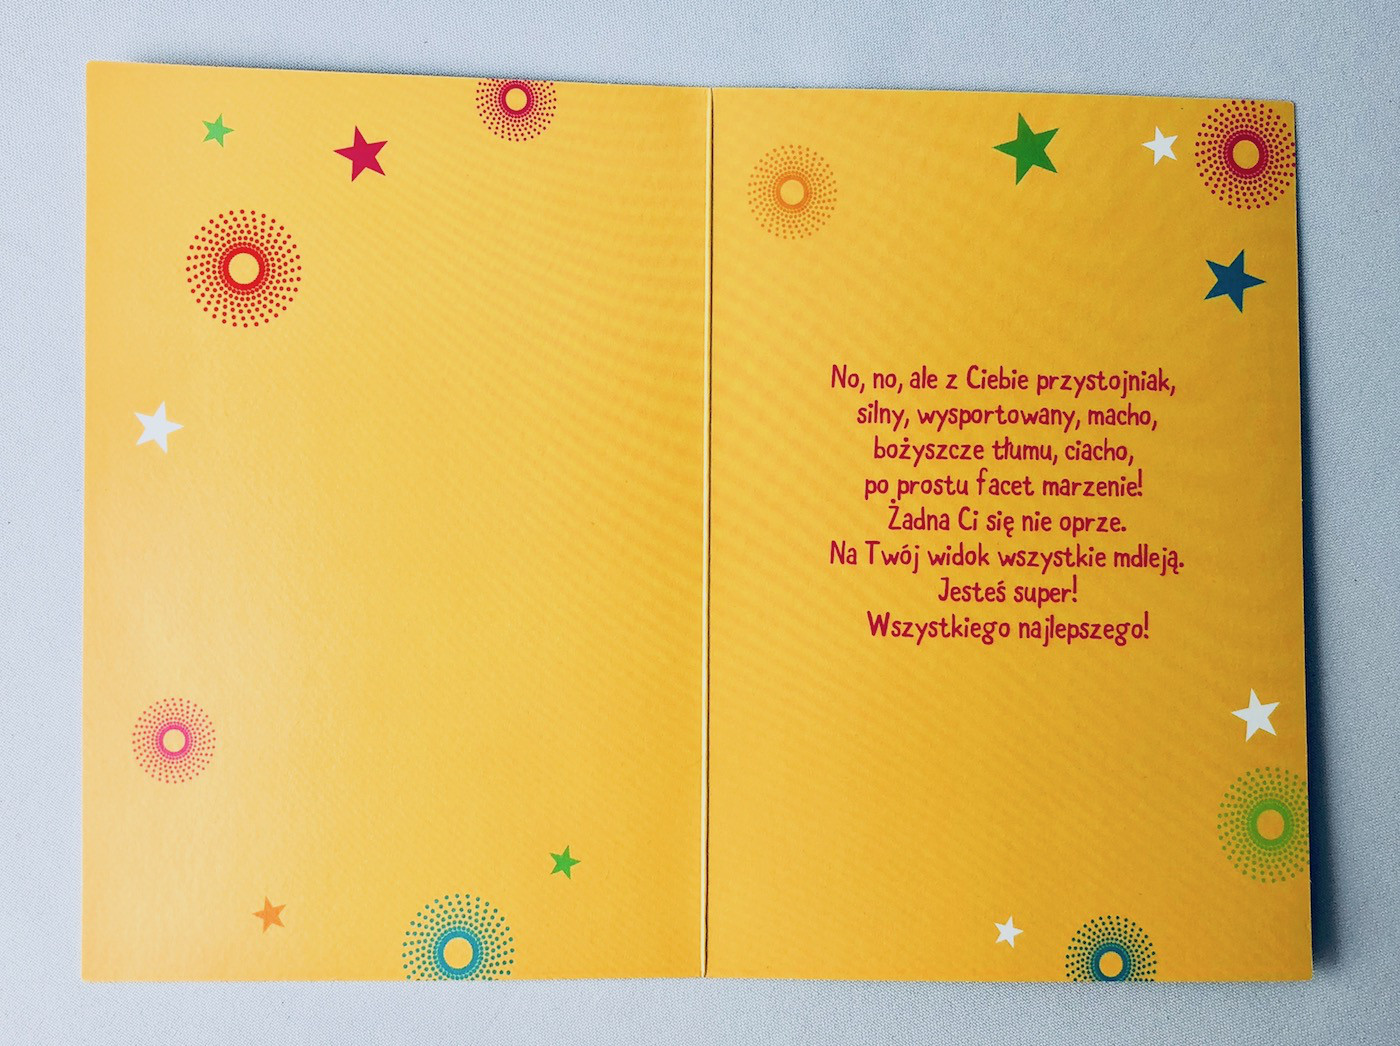 Karnet na urodziny / HM-200-1561